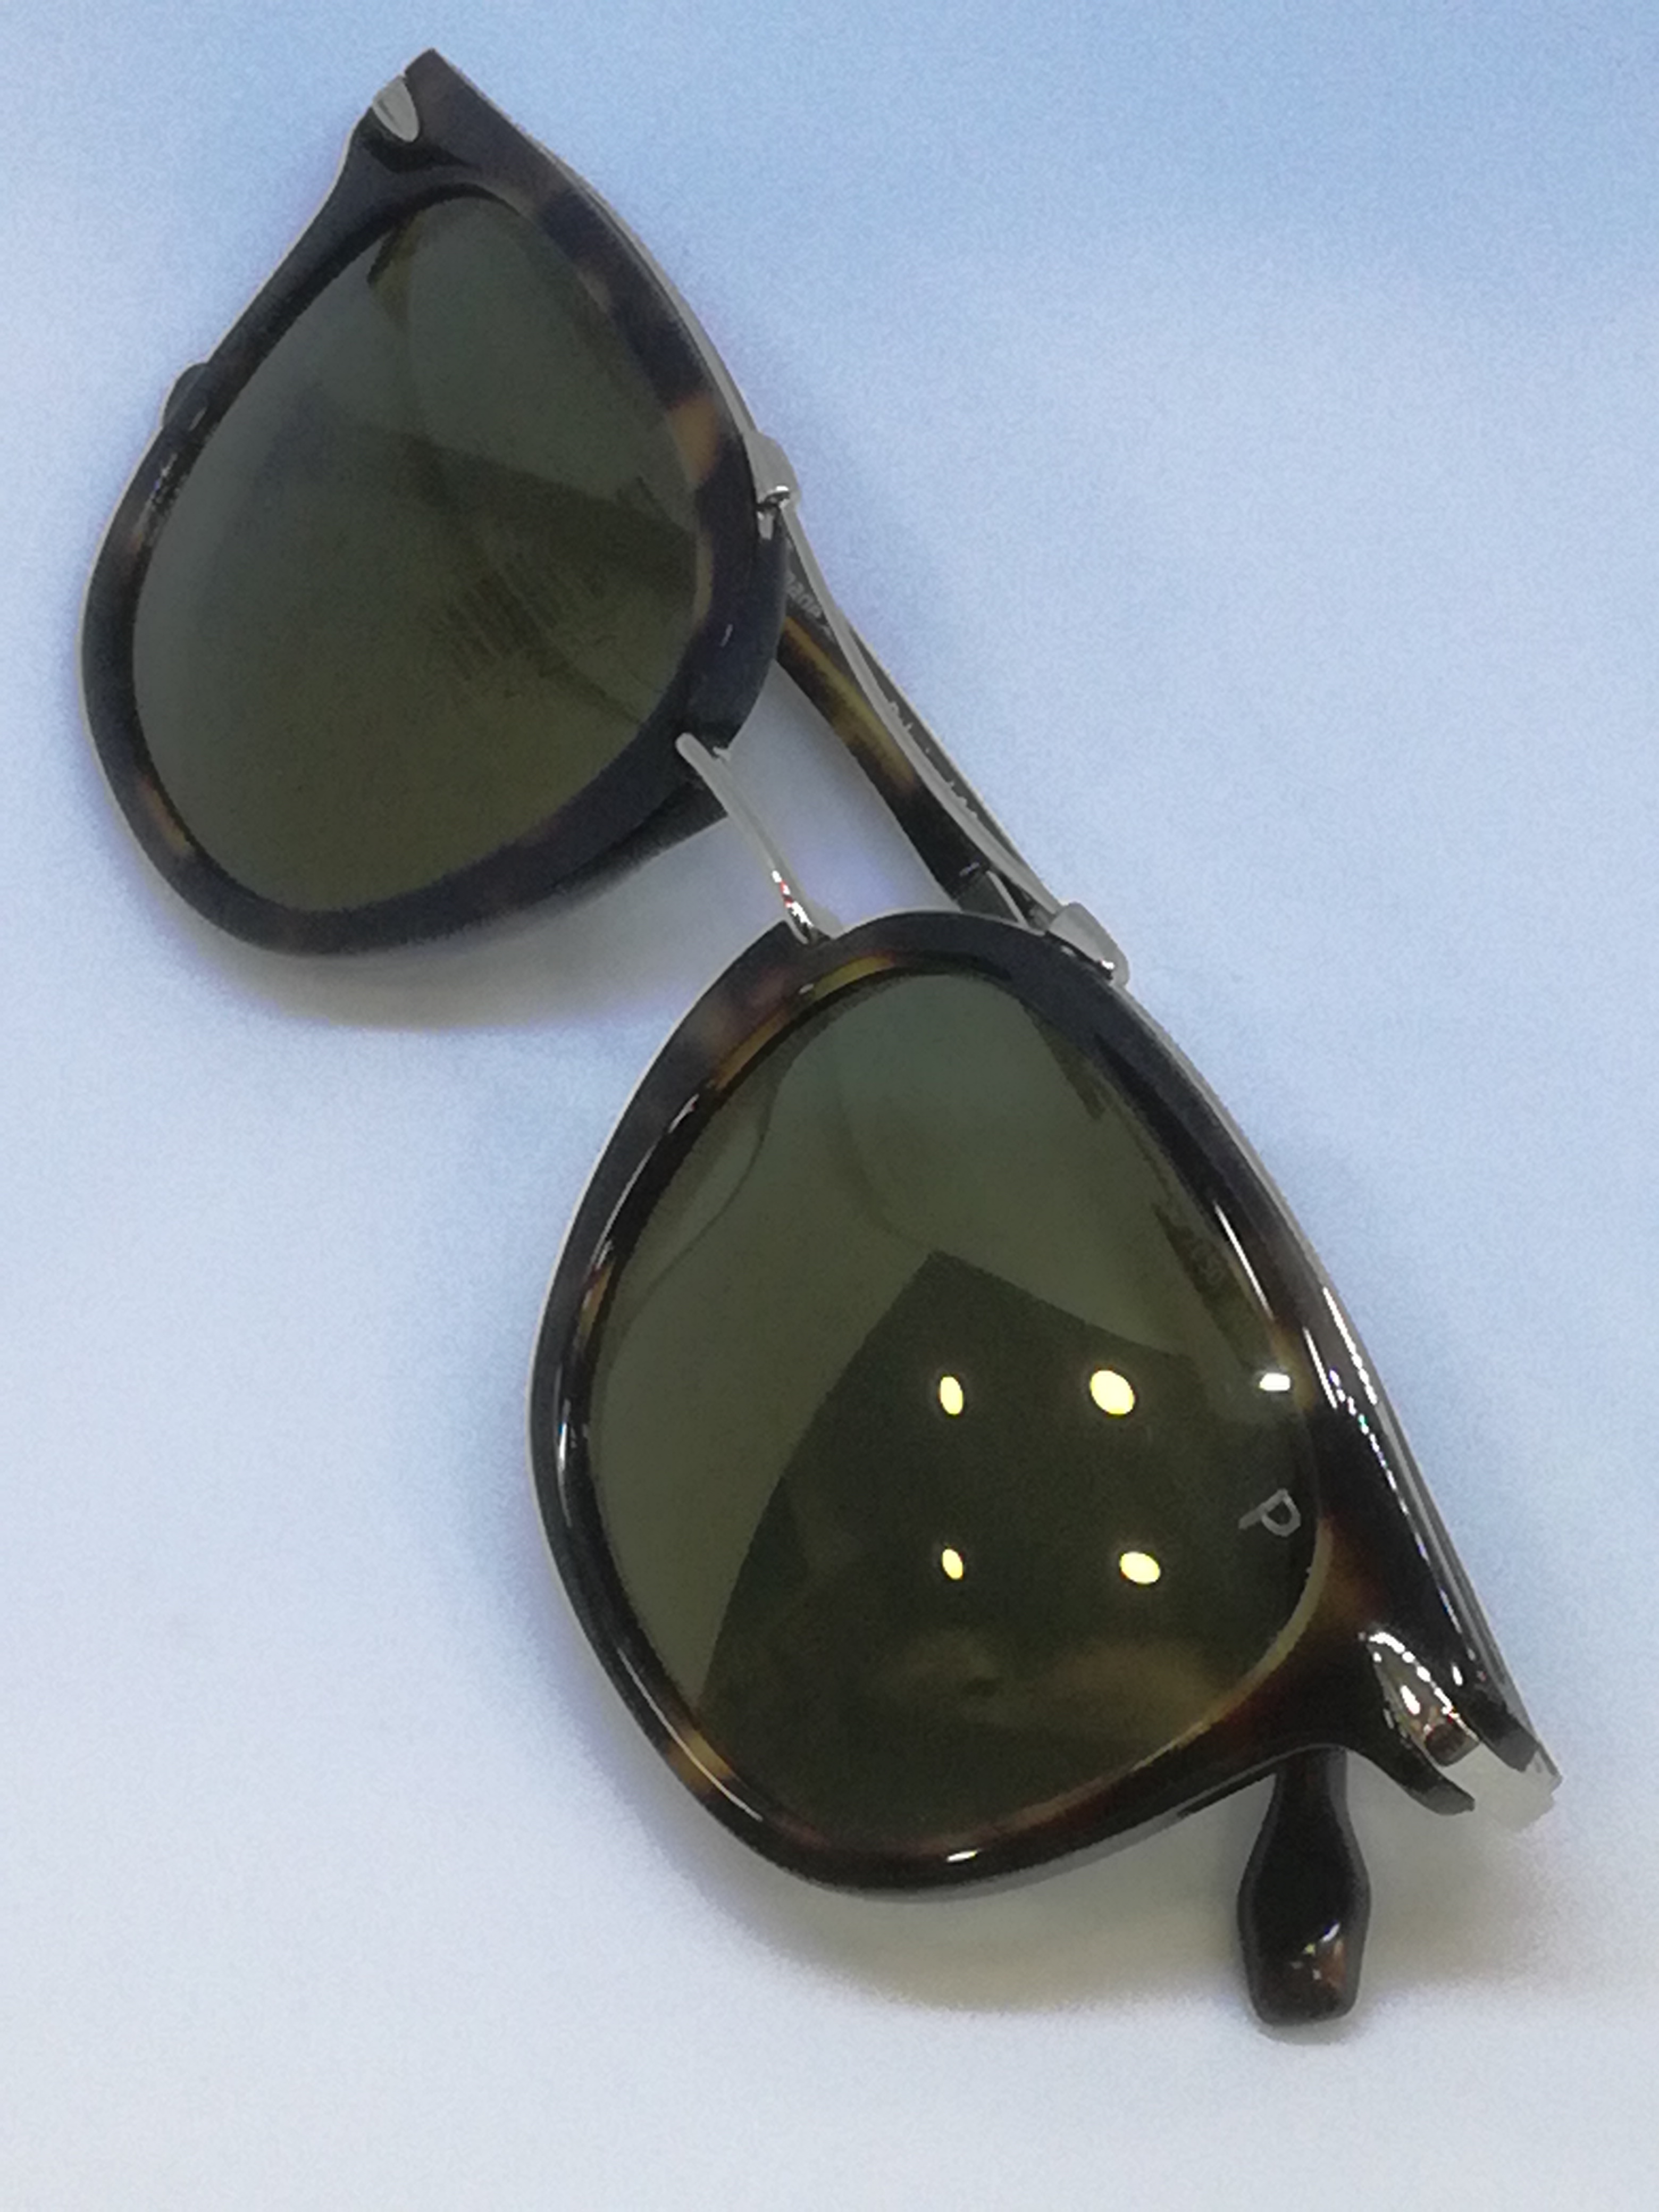 719c72f344 FERRE GF 1050-002-20 Unisex Polarized Sunglasses